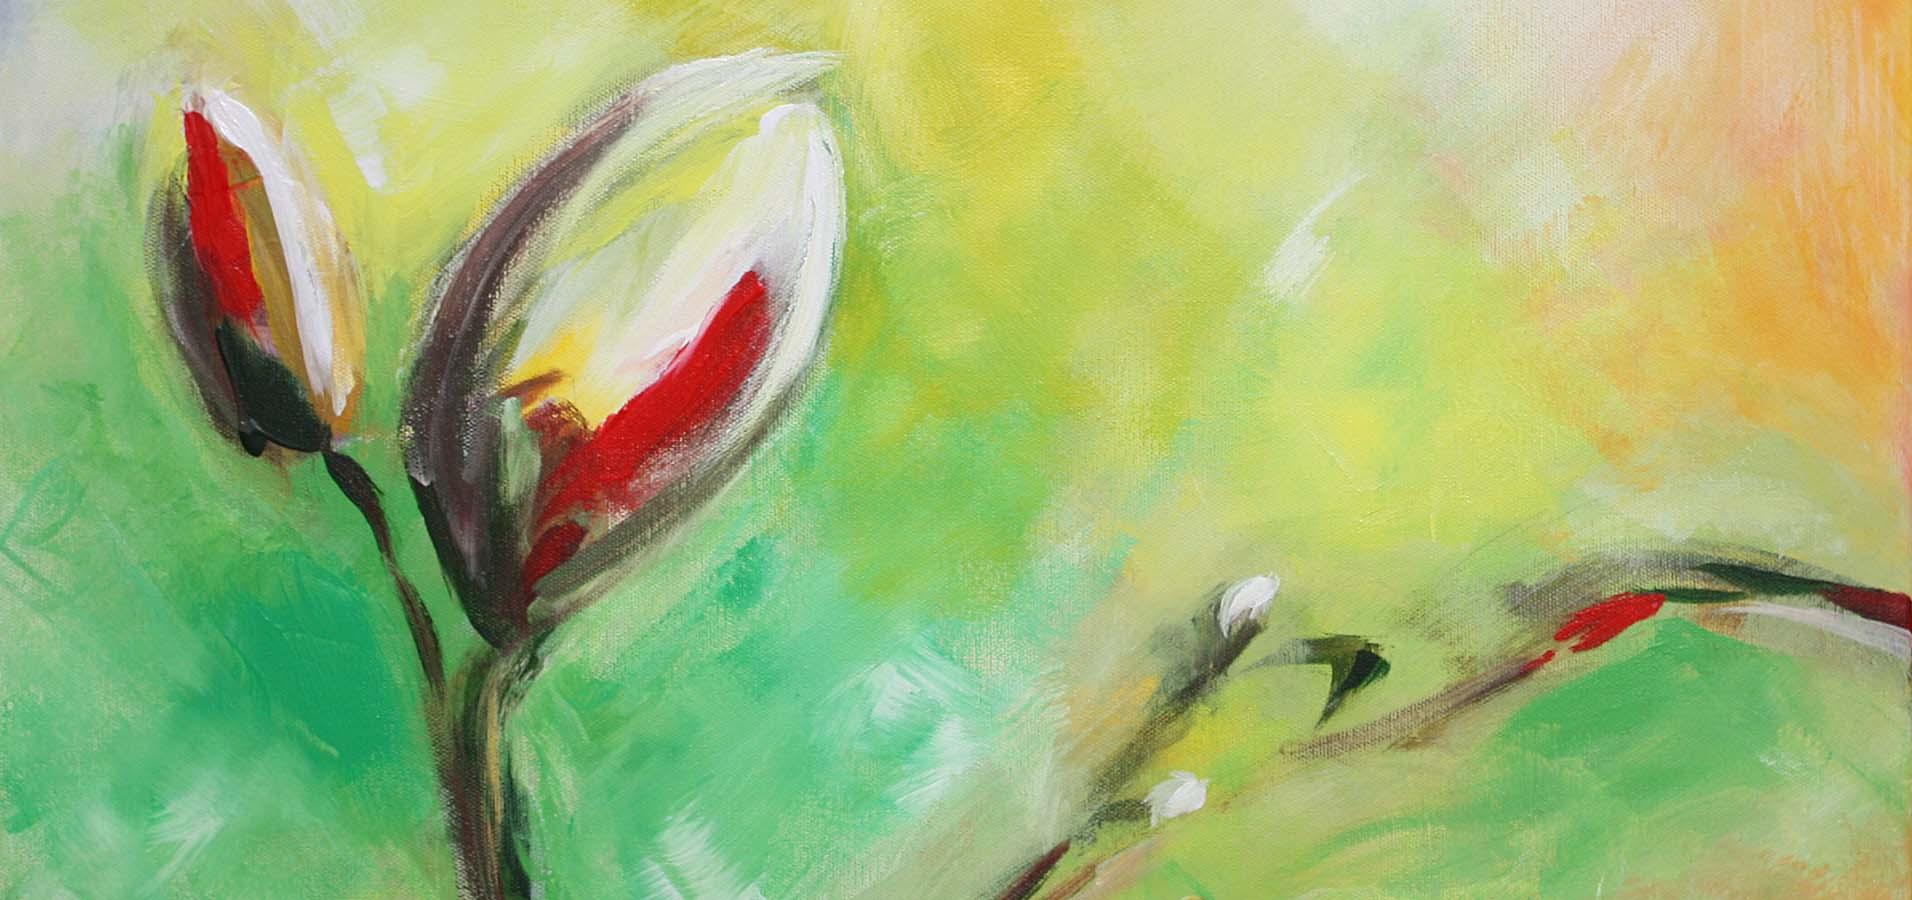 Merle Neumann malt - Bildmotiv Neues Leben